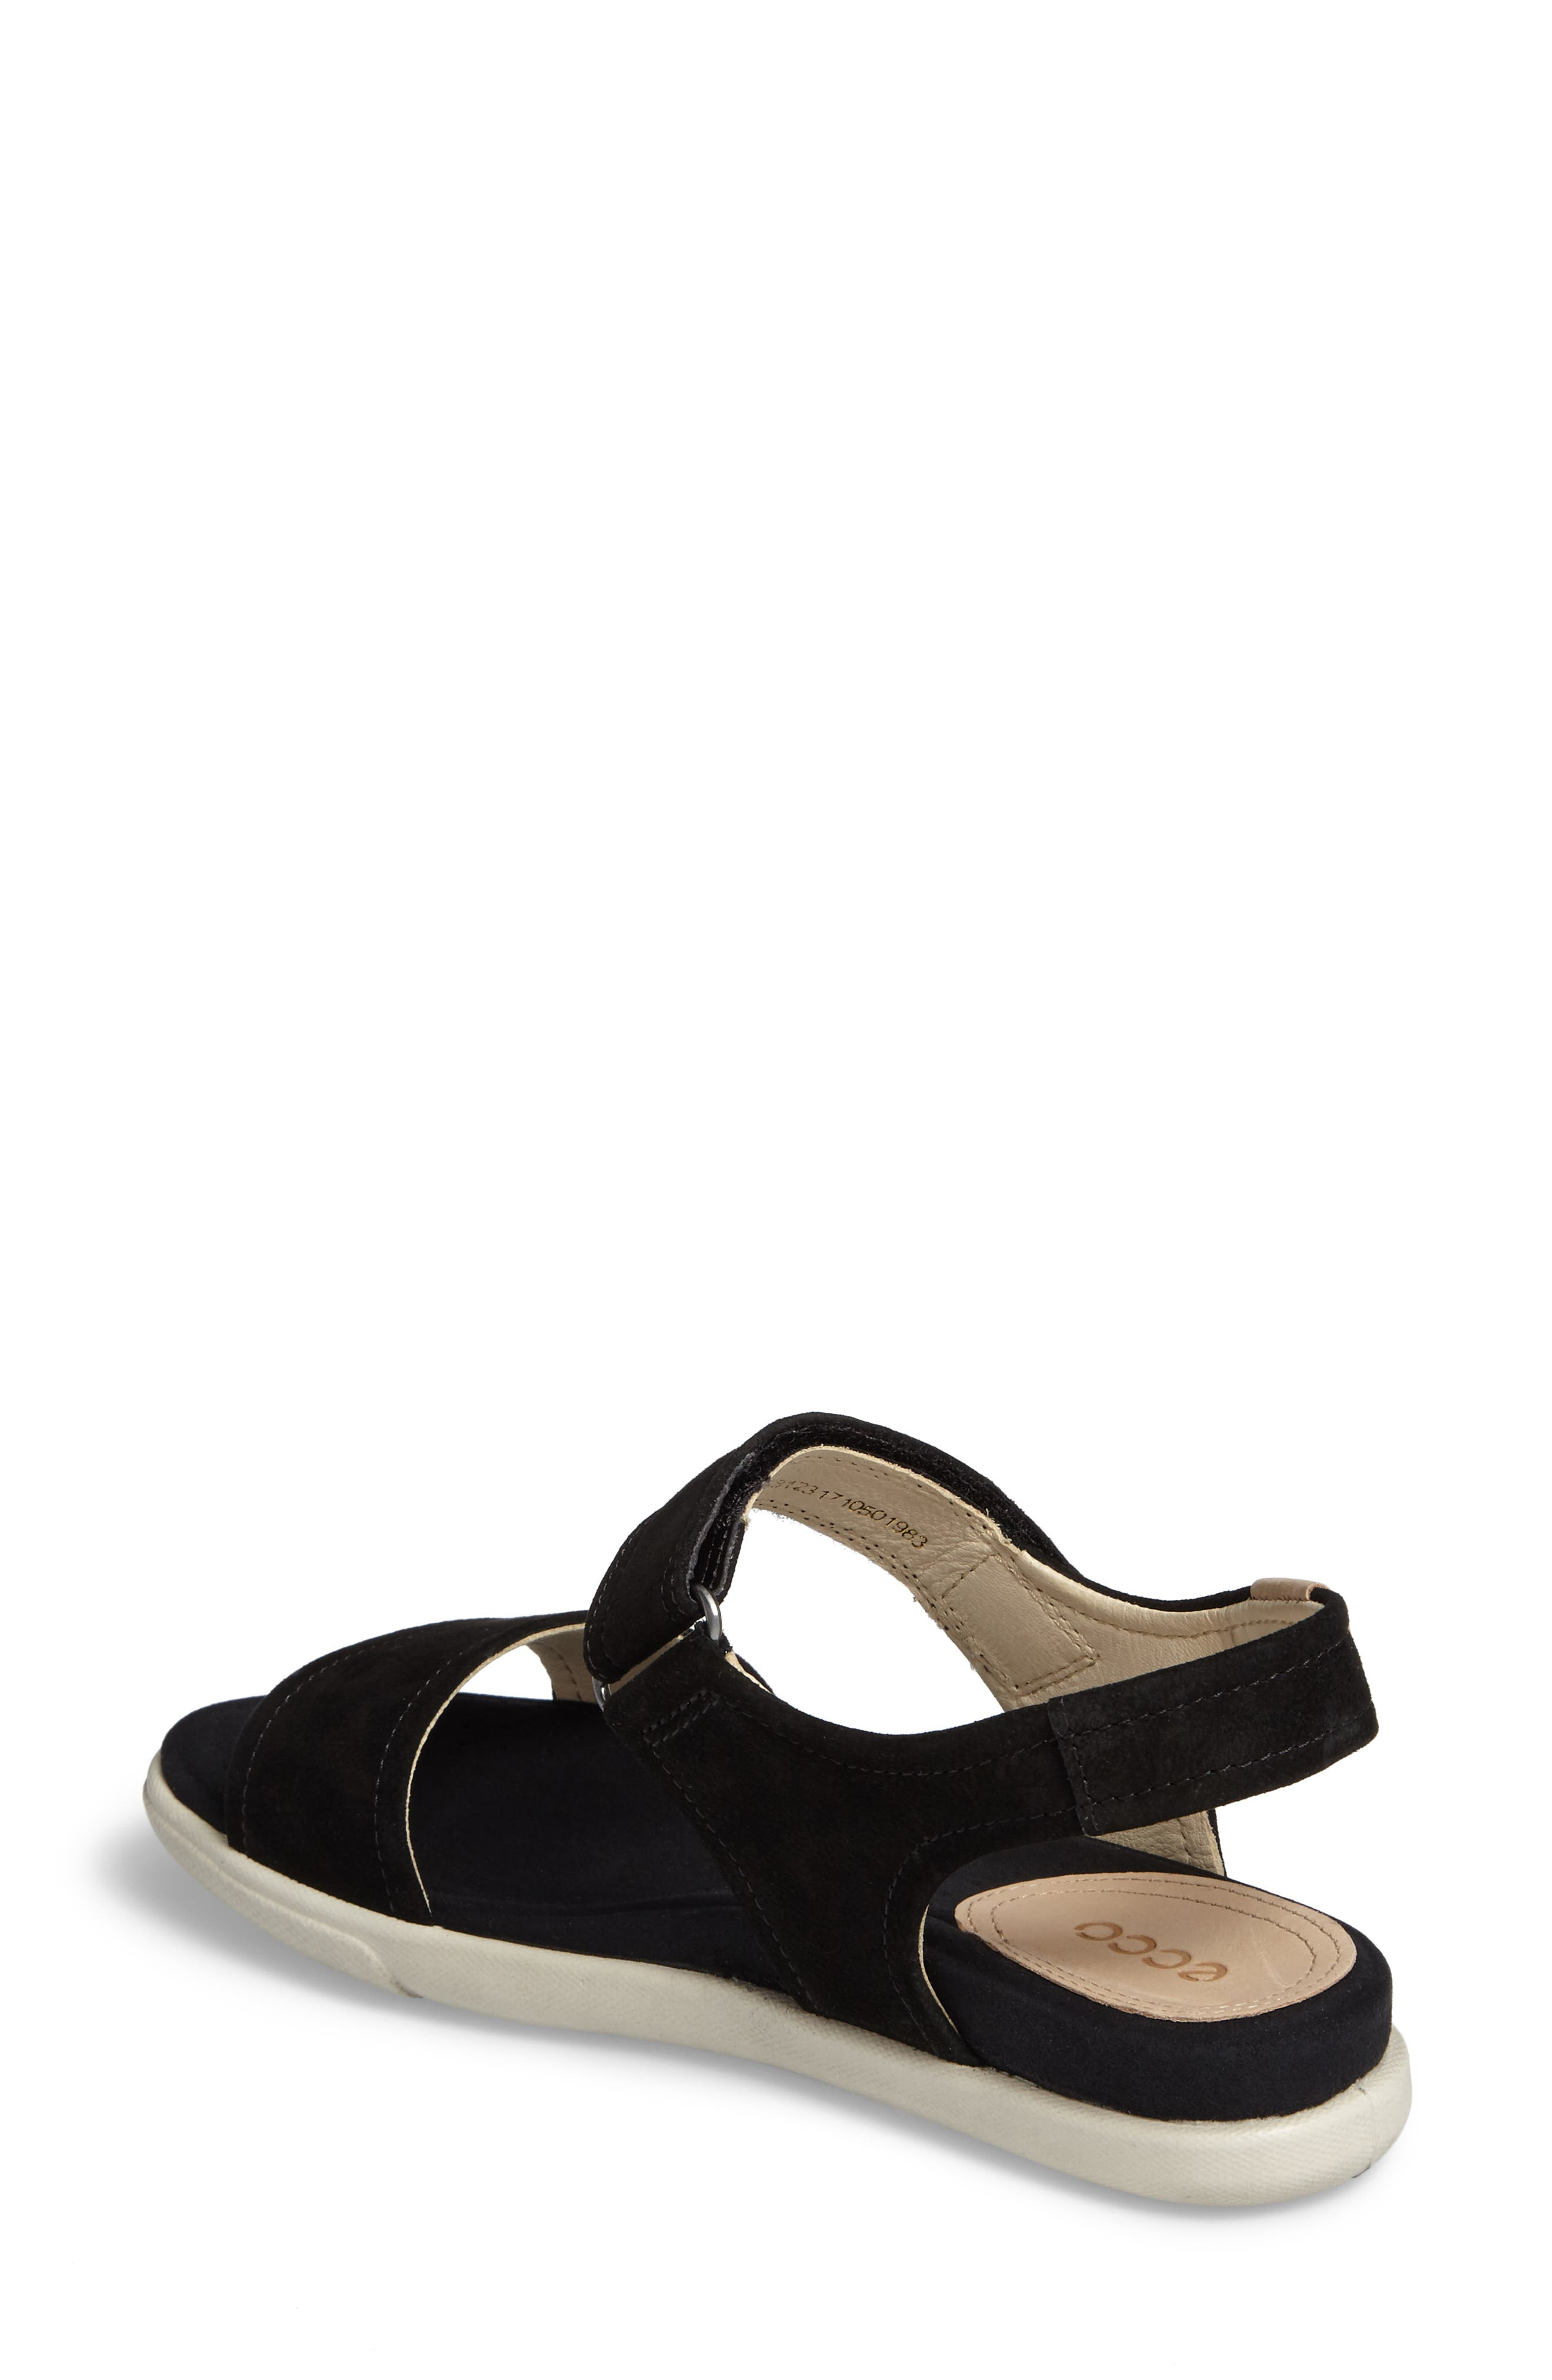 'Damara' Strap Sandal,                             Alternate thumbnail 4, color,